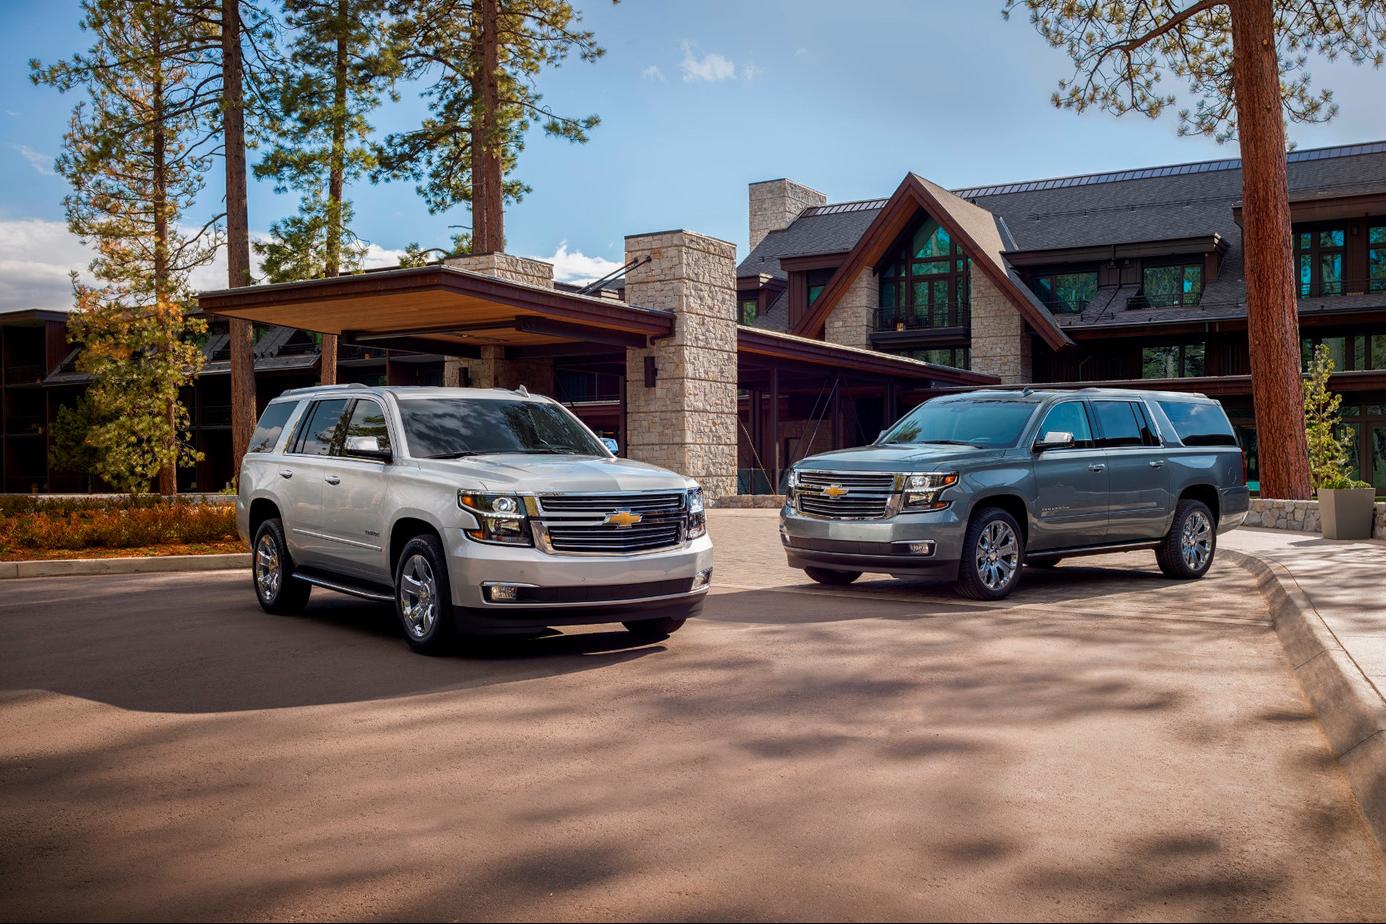 khung-long-my-chevrolet-tahoe-2019-gia-tu-1.jpg